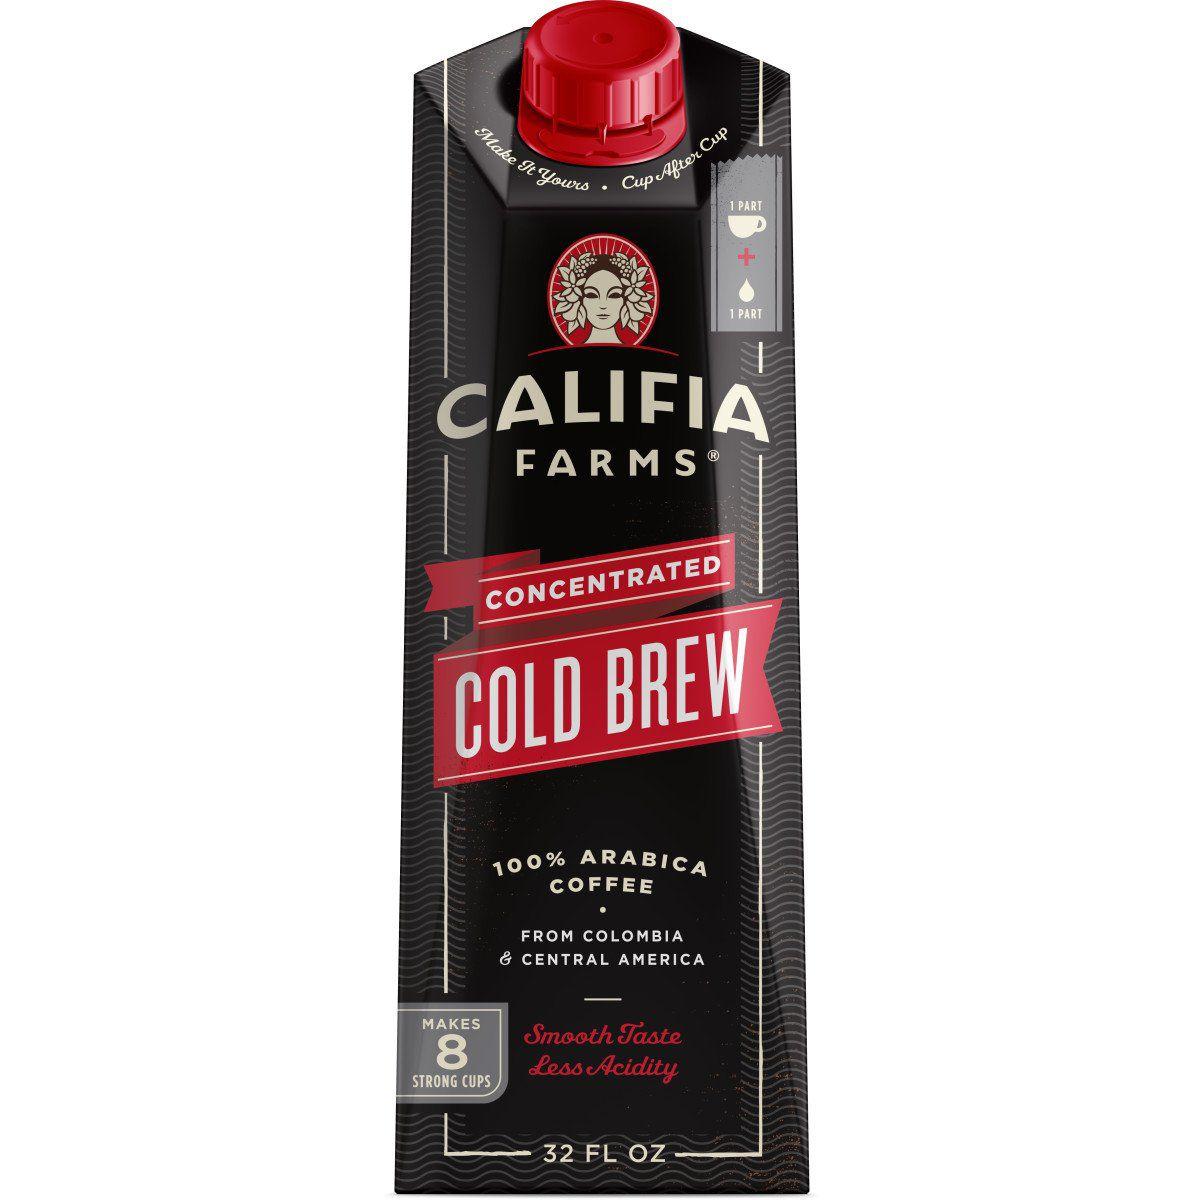 Califia Farms Concentrated Cold Brew Coffee